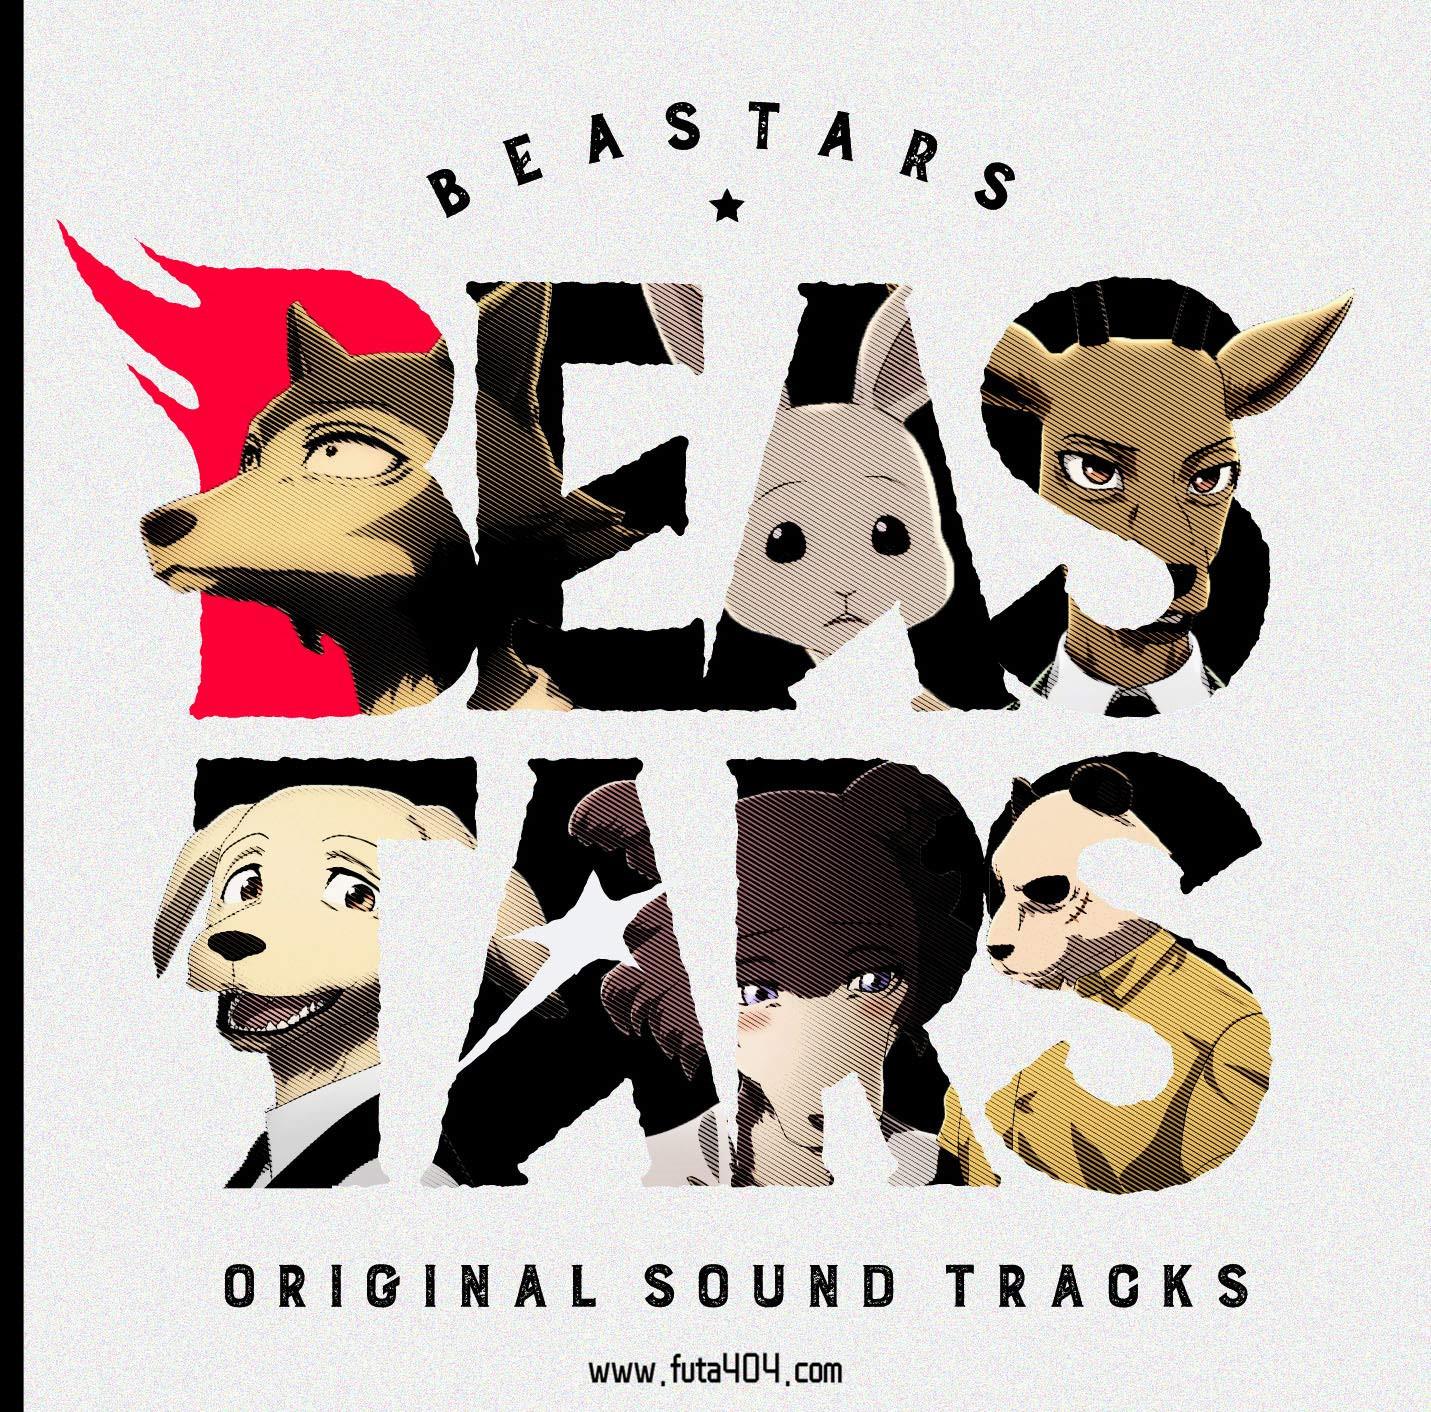 BEASTARS动物狂想曲OST专辑下载 BEASTARS 动漫音乐 第1张